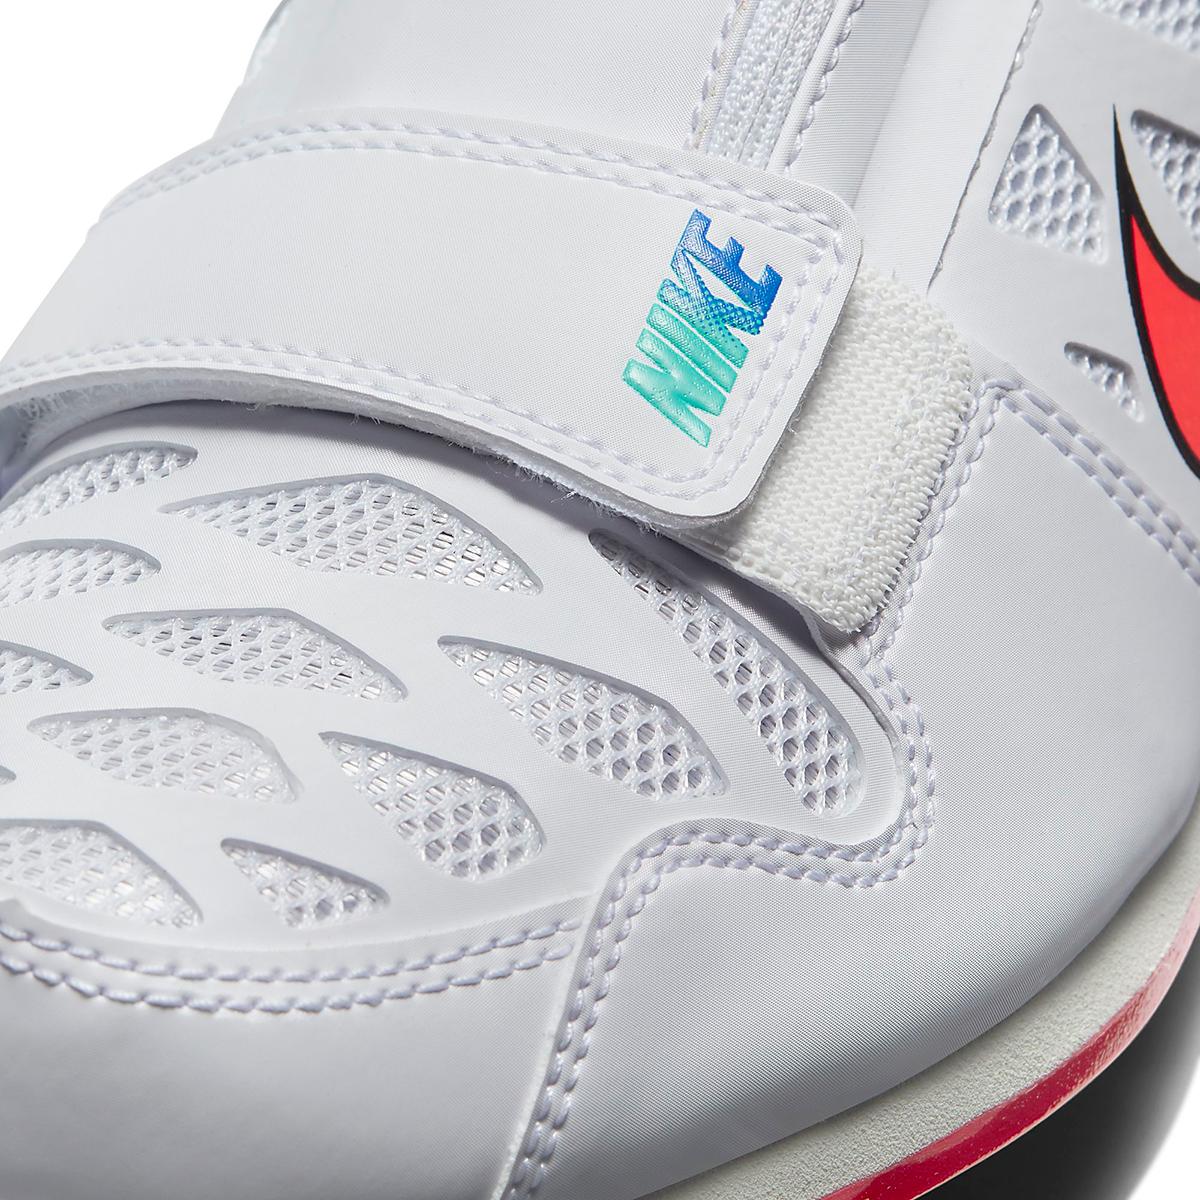 Nike Zoom Long Jump 4 Track Spikes - Color: White/Flash Crimson - Size: M4/W5.5 - Width: Regular, White/Flash Crimson, large, image 7